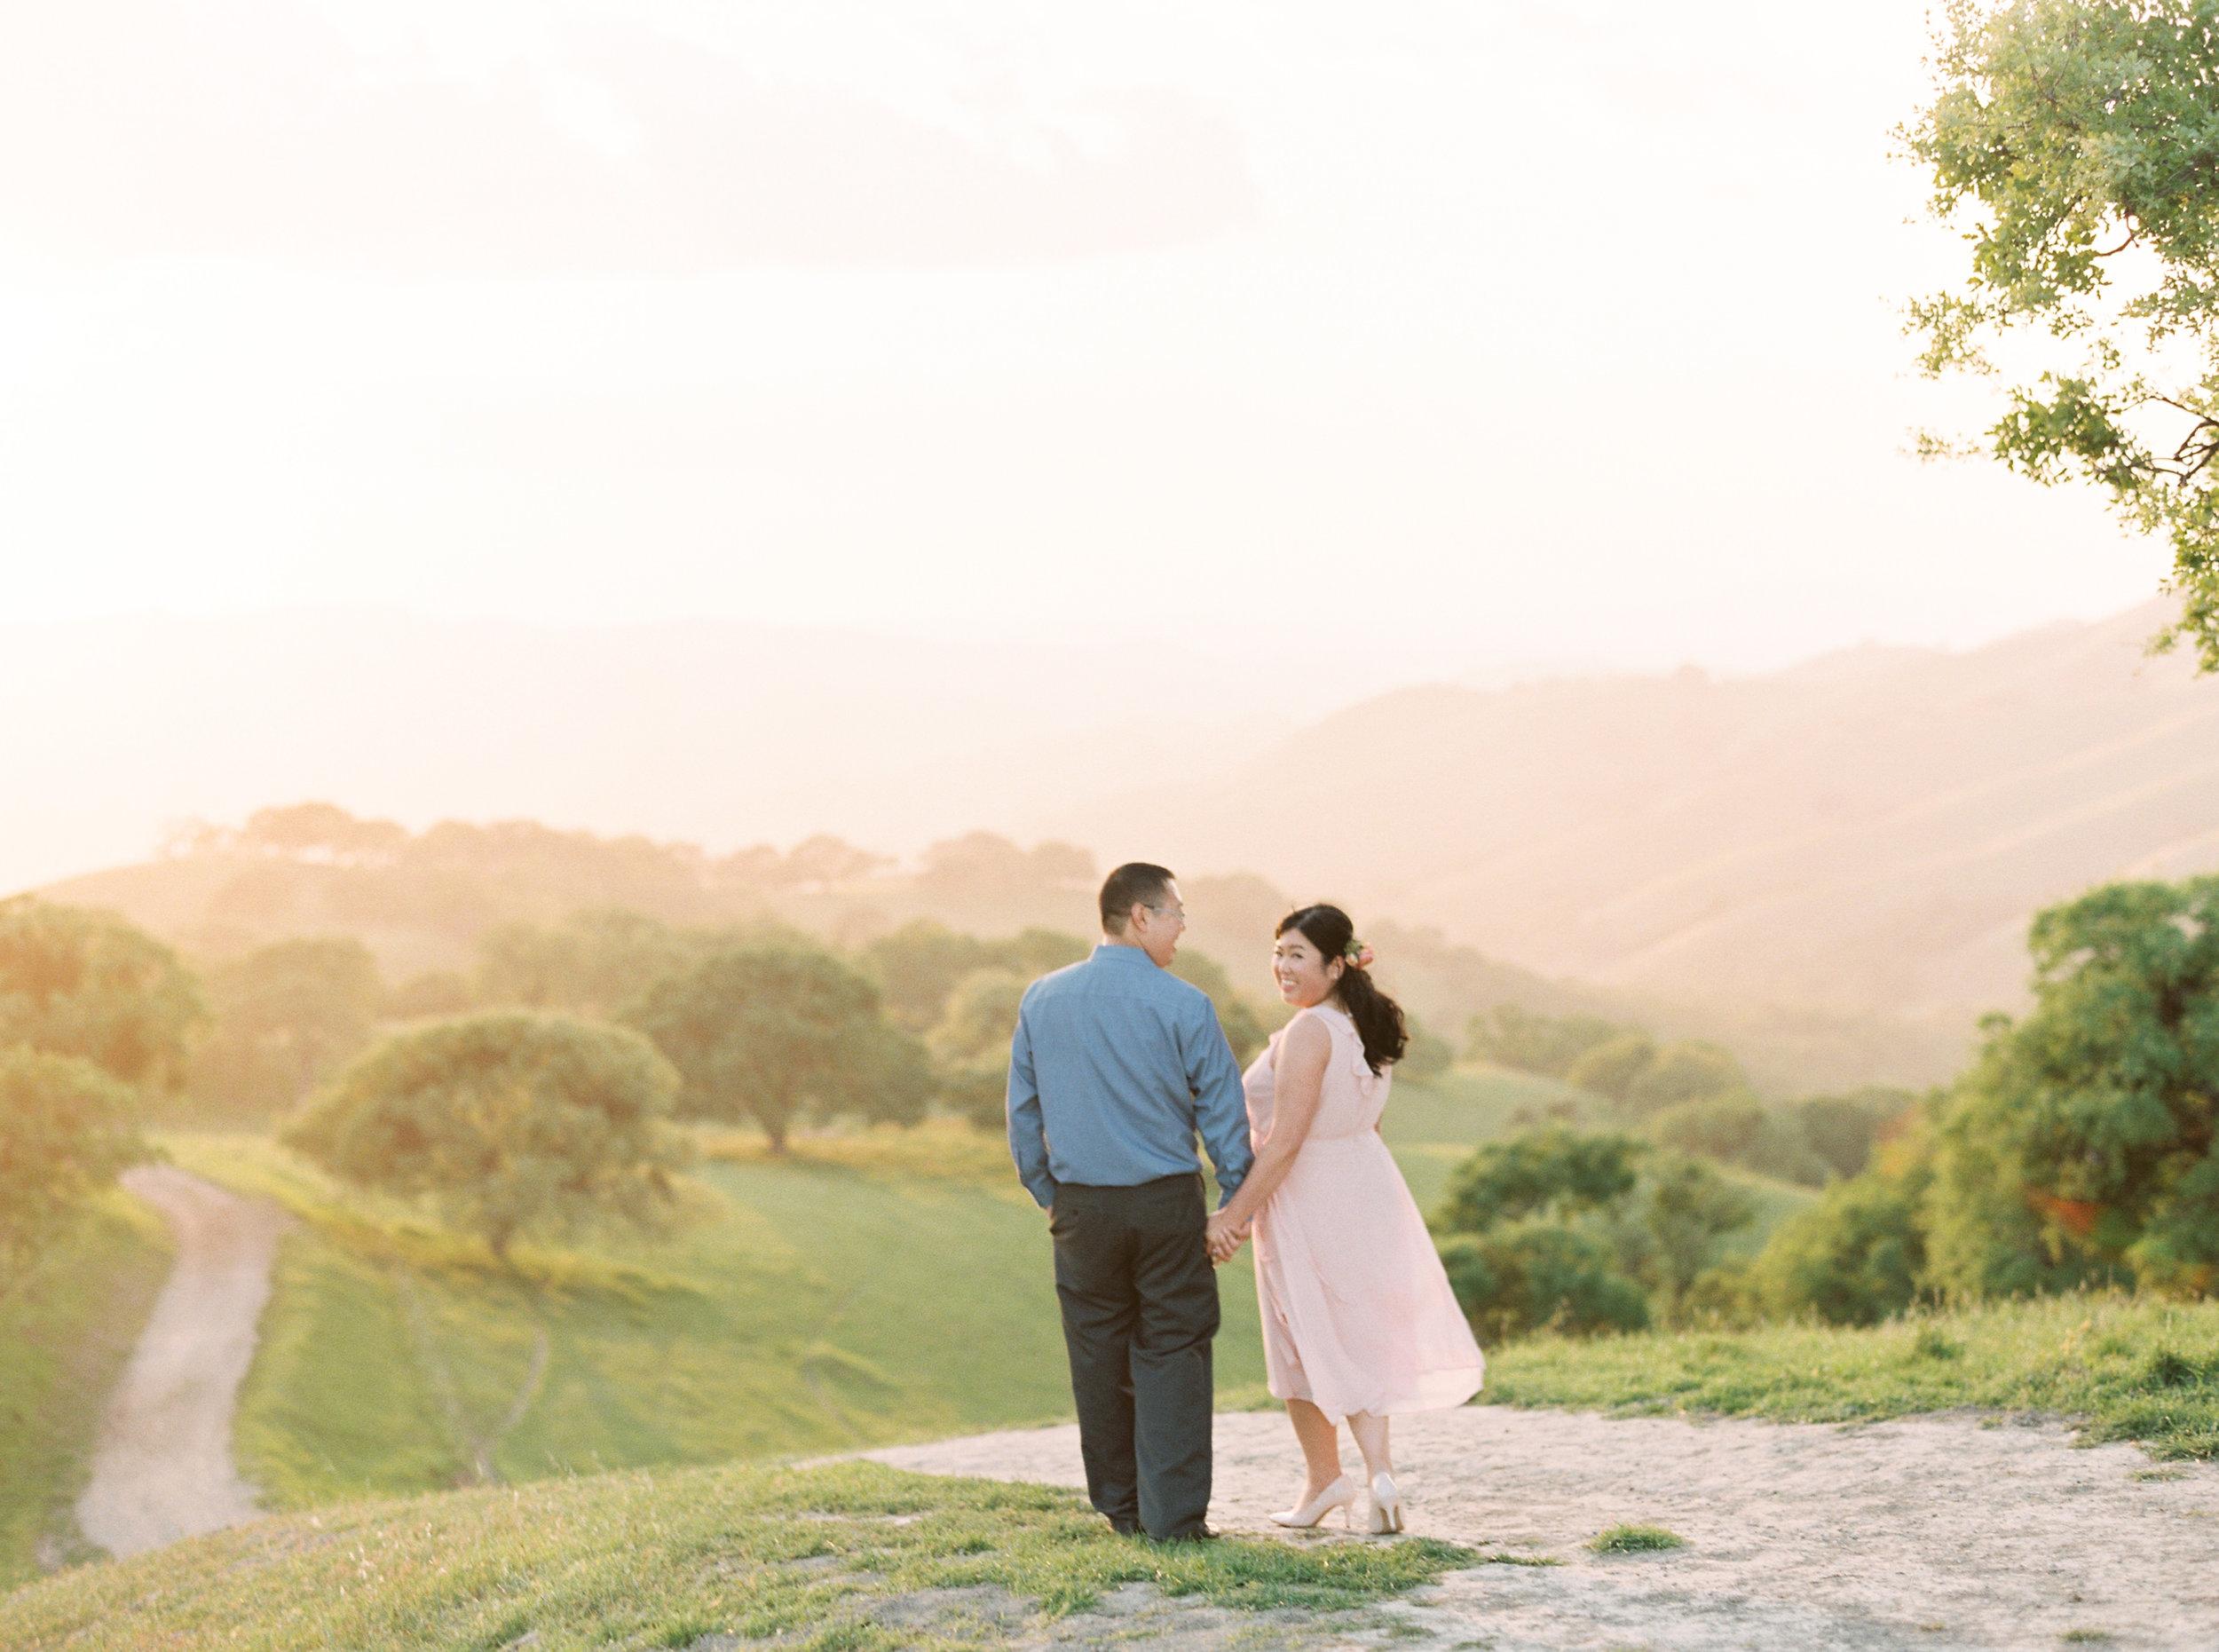 del-valle-livermore-bay-area-wedding-photographer-44.jpg